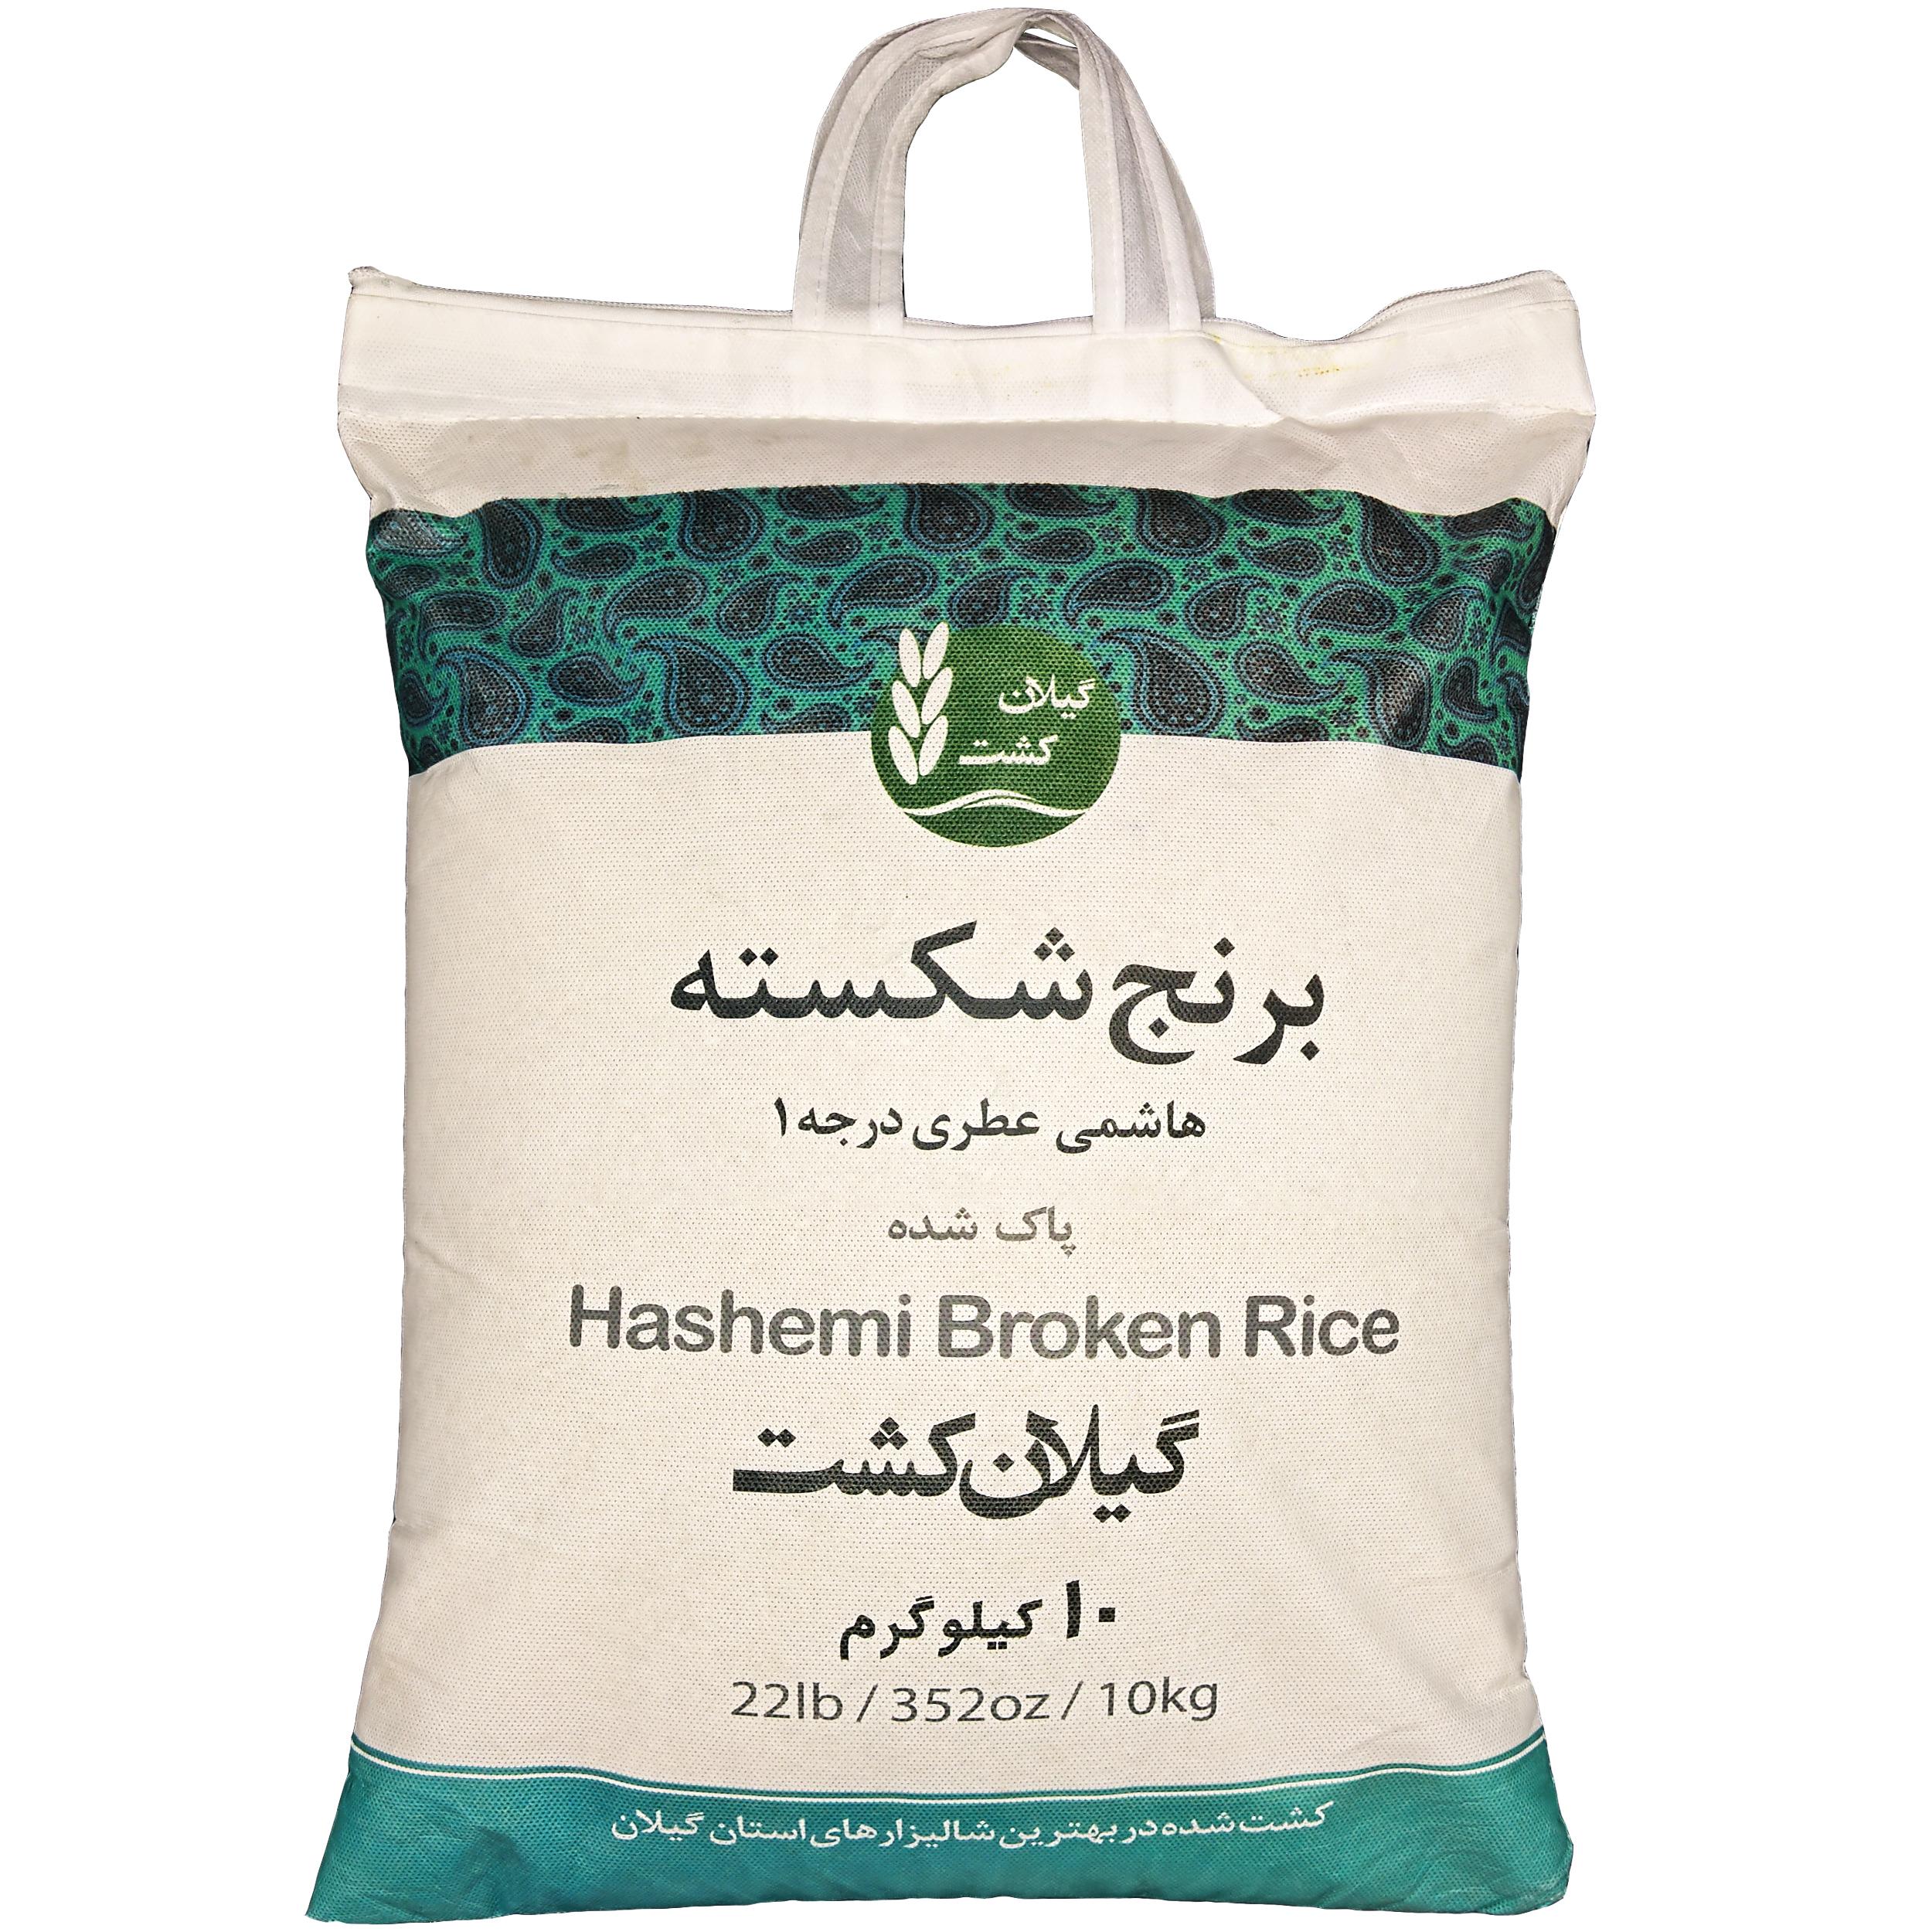 برنج شکسته هاشمی عطری گیلان کشت - 10 کیلوگرم